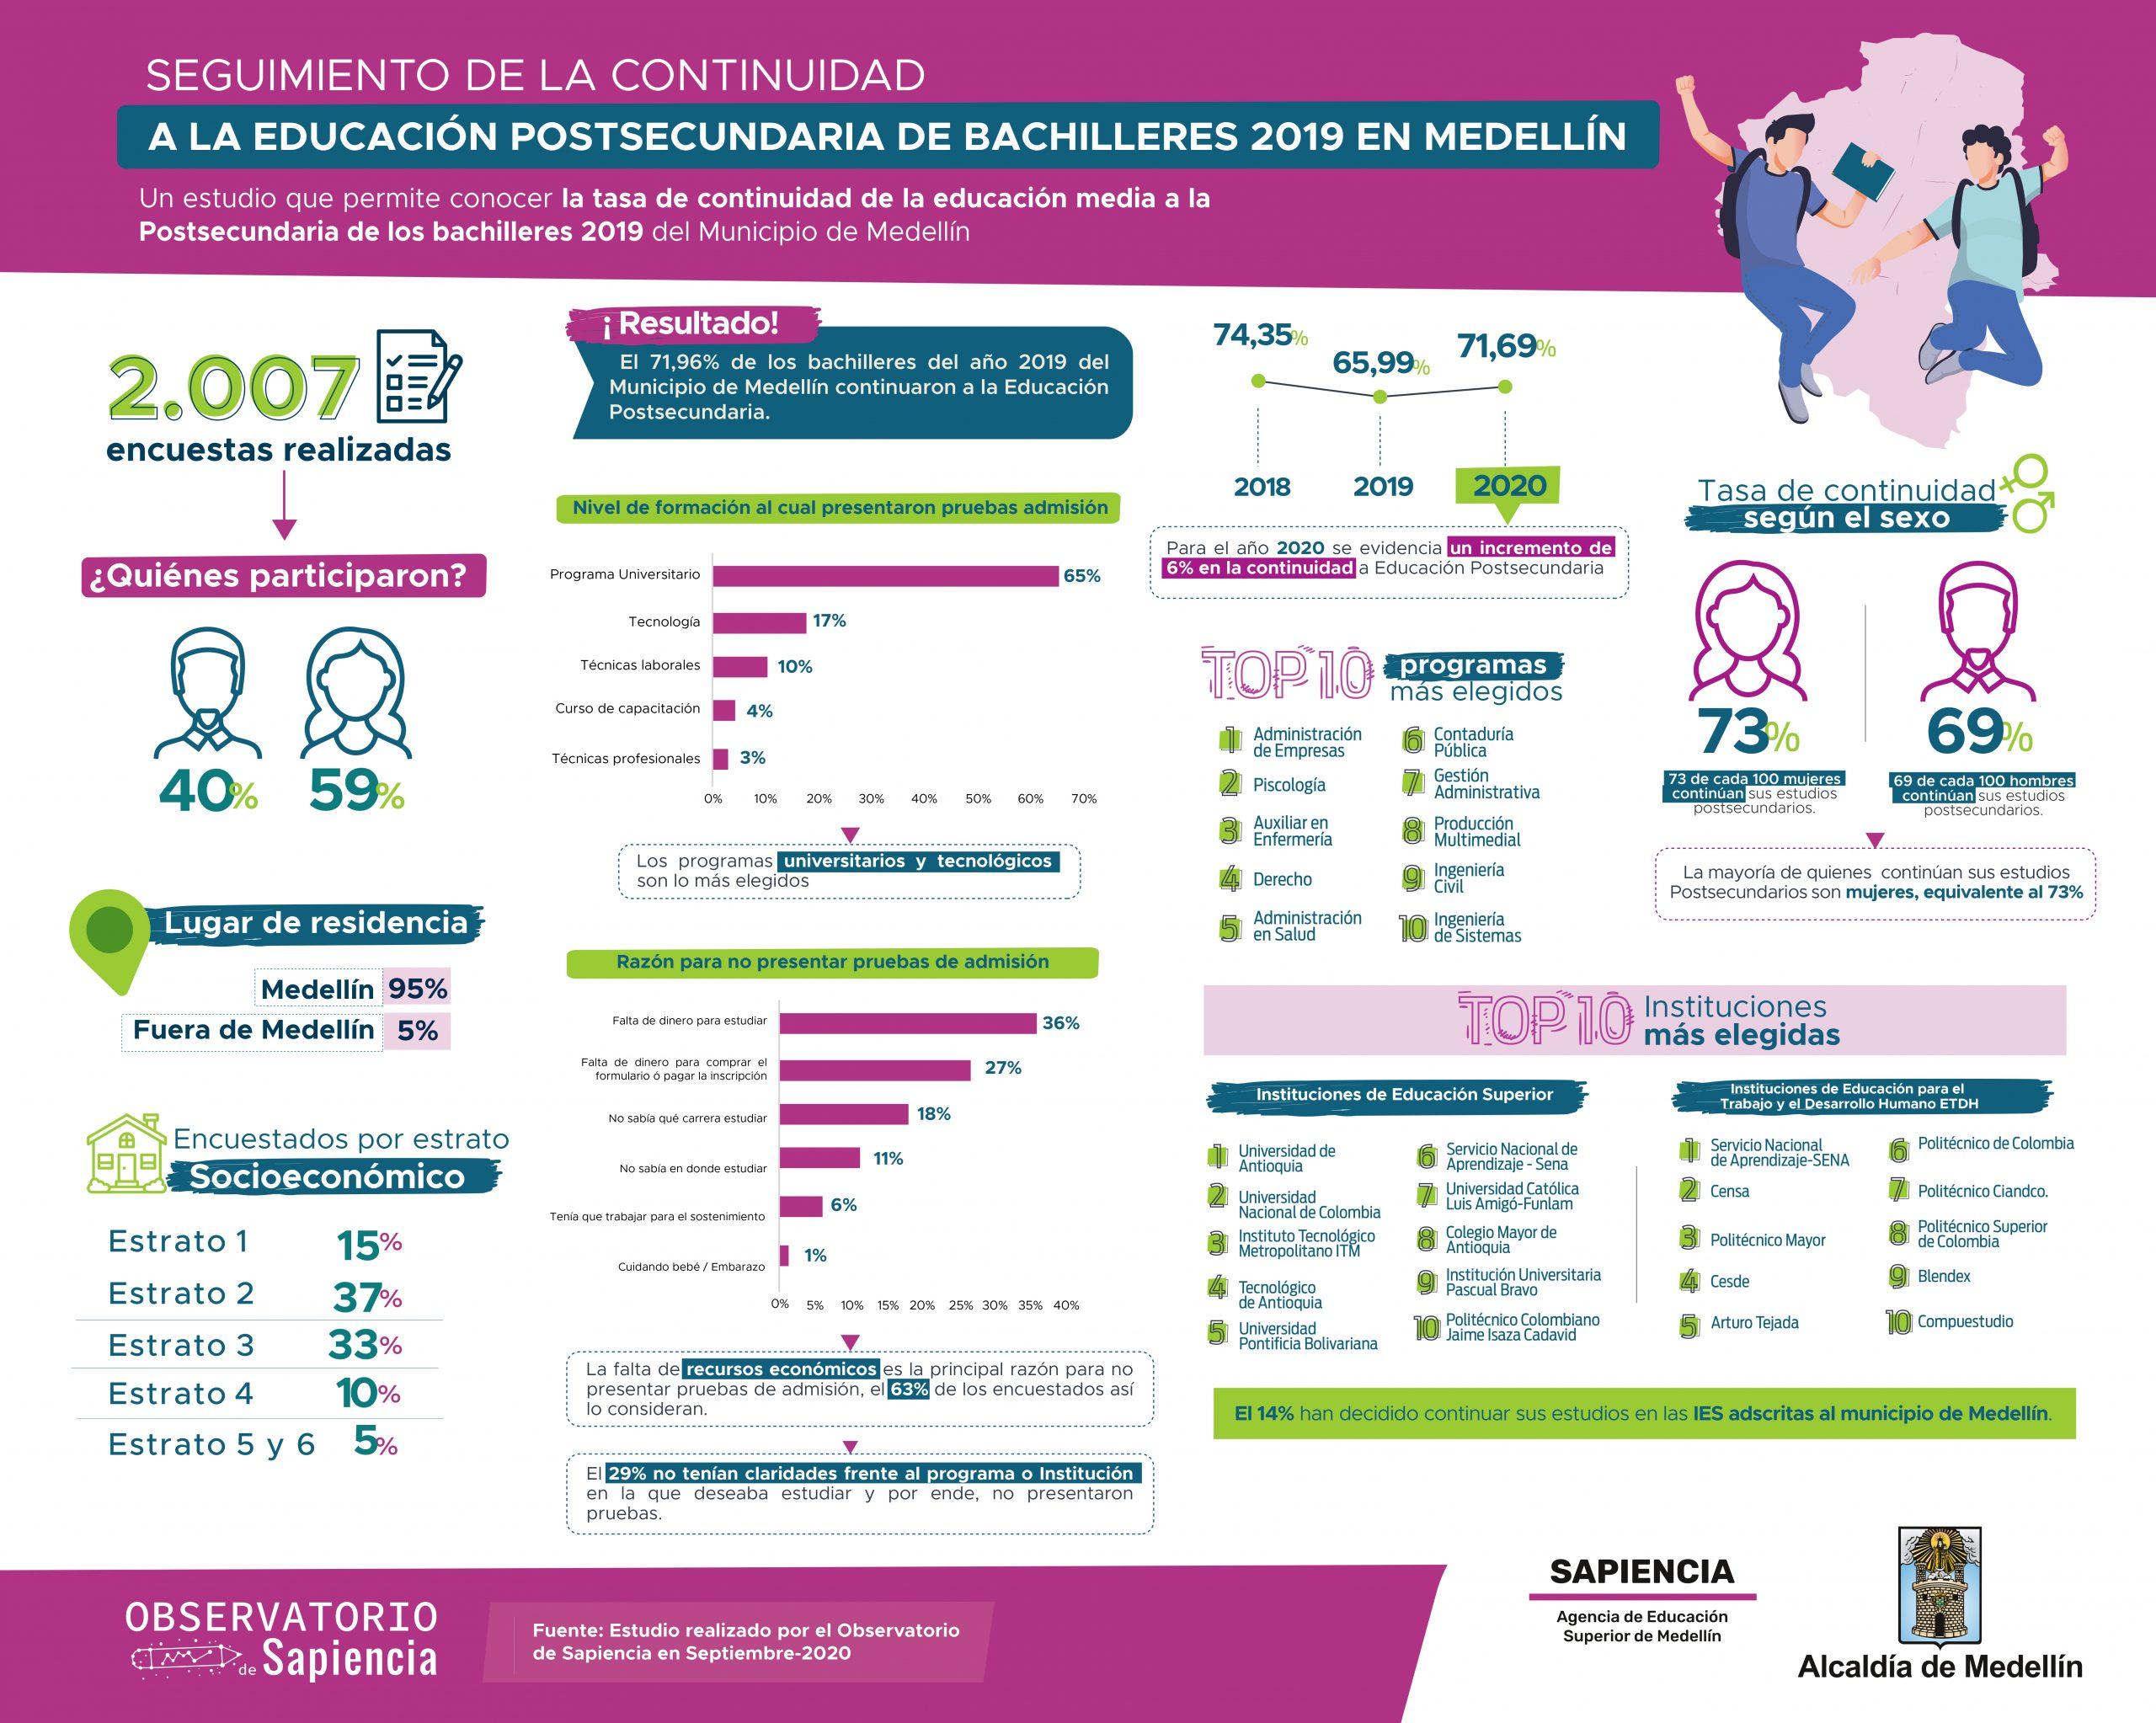 infografia_seguimiento